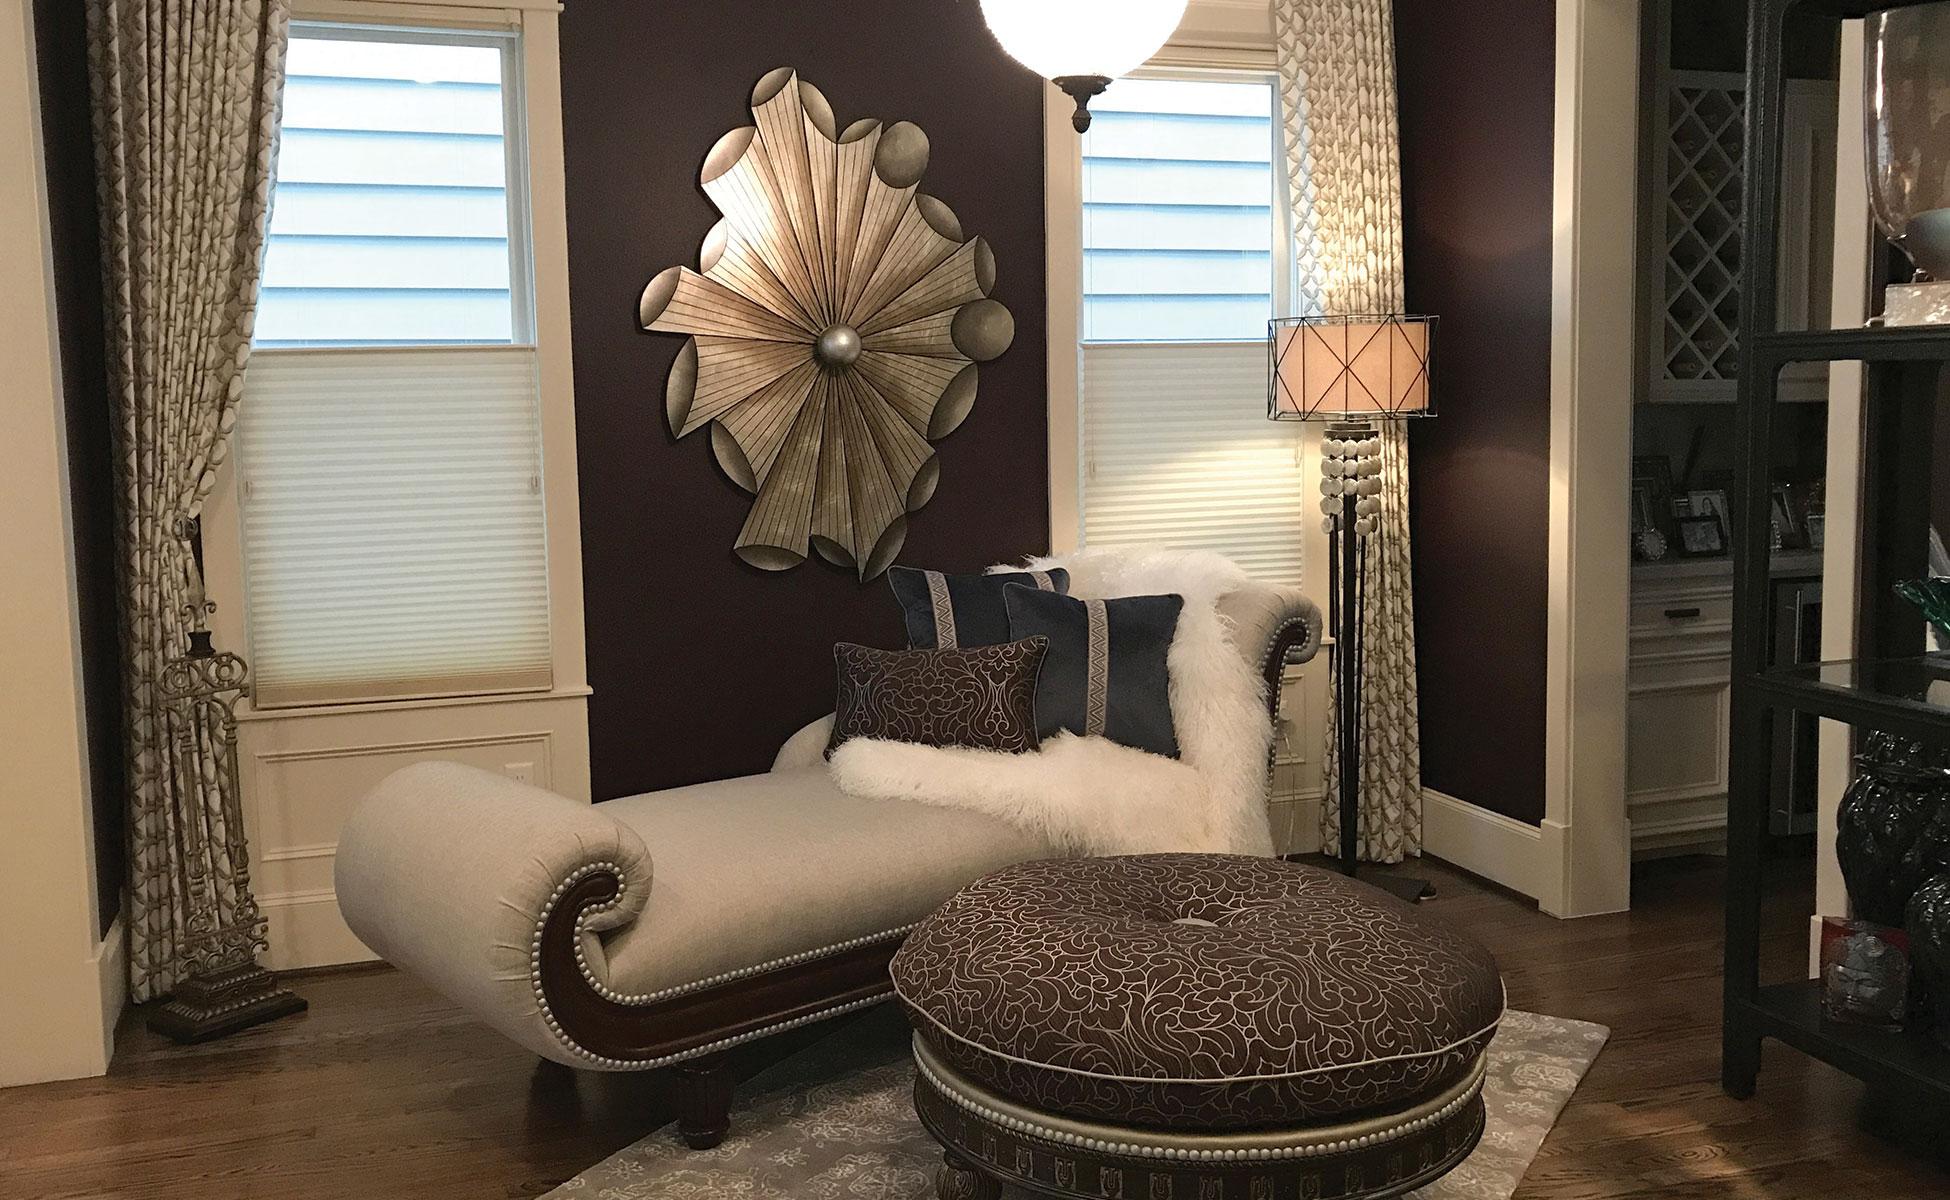 Kaleidoscope Studio of Interior Design